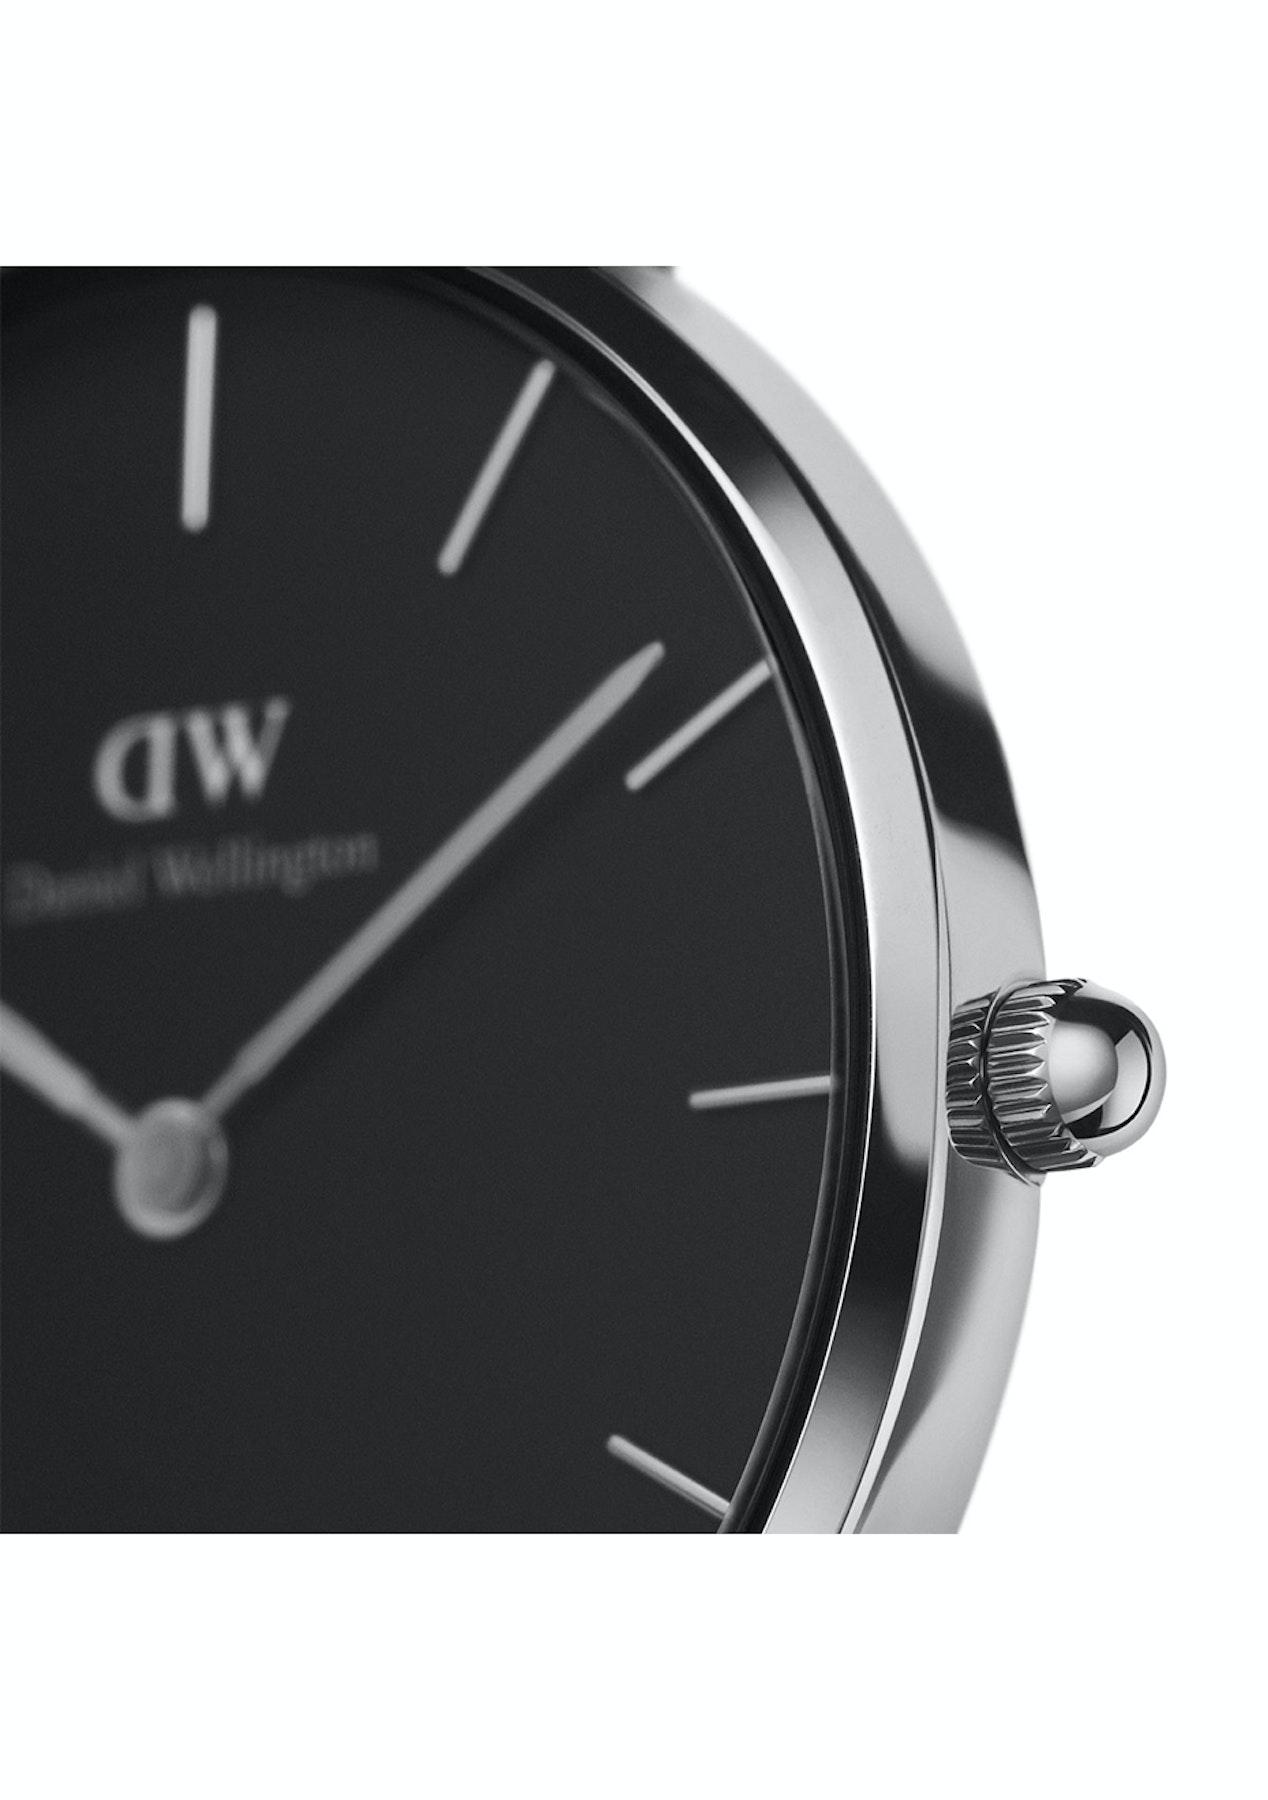 2c86615c6570 Daniel Wellington - St Mawes 36mm Classic Black Watch - Silver - Daniel  Wellington - 40% off - Onceit